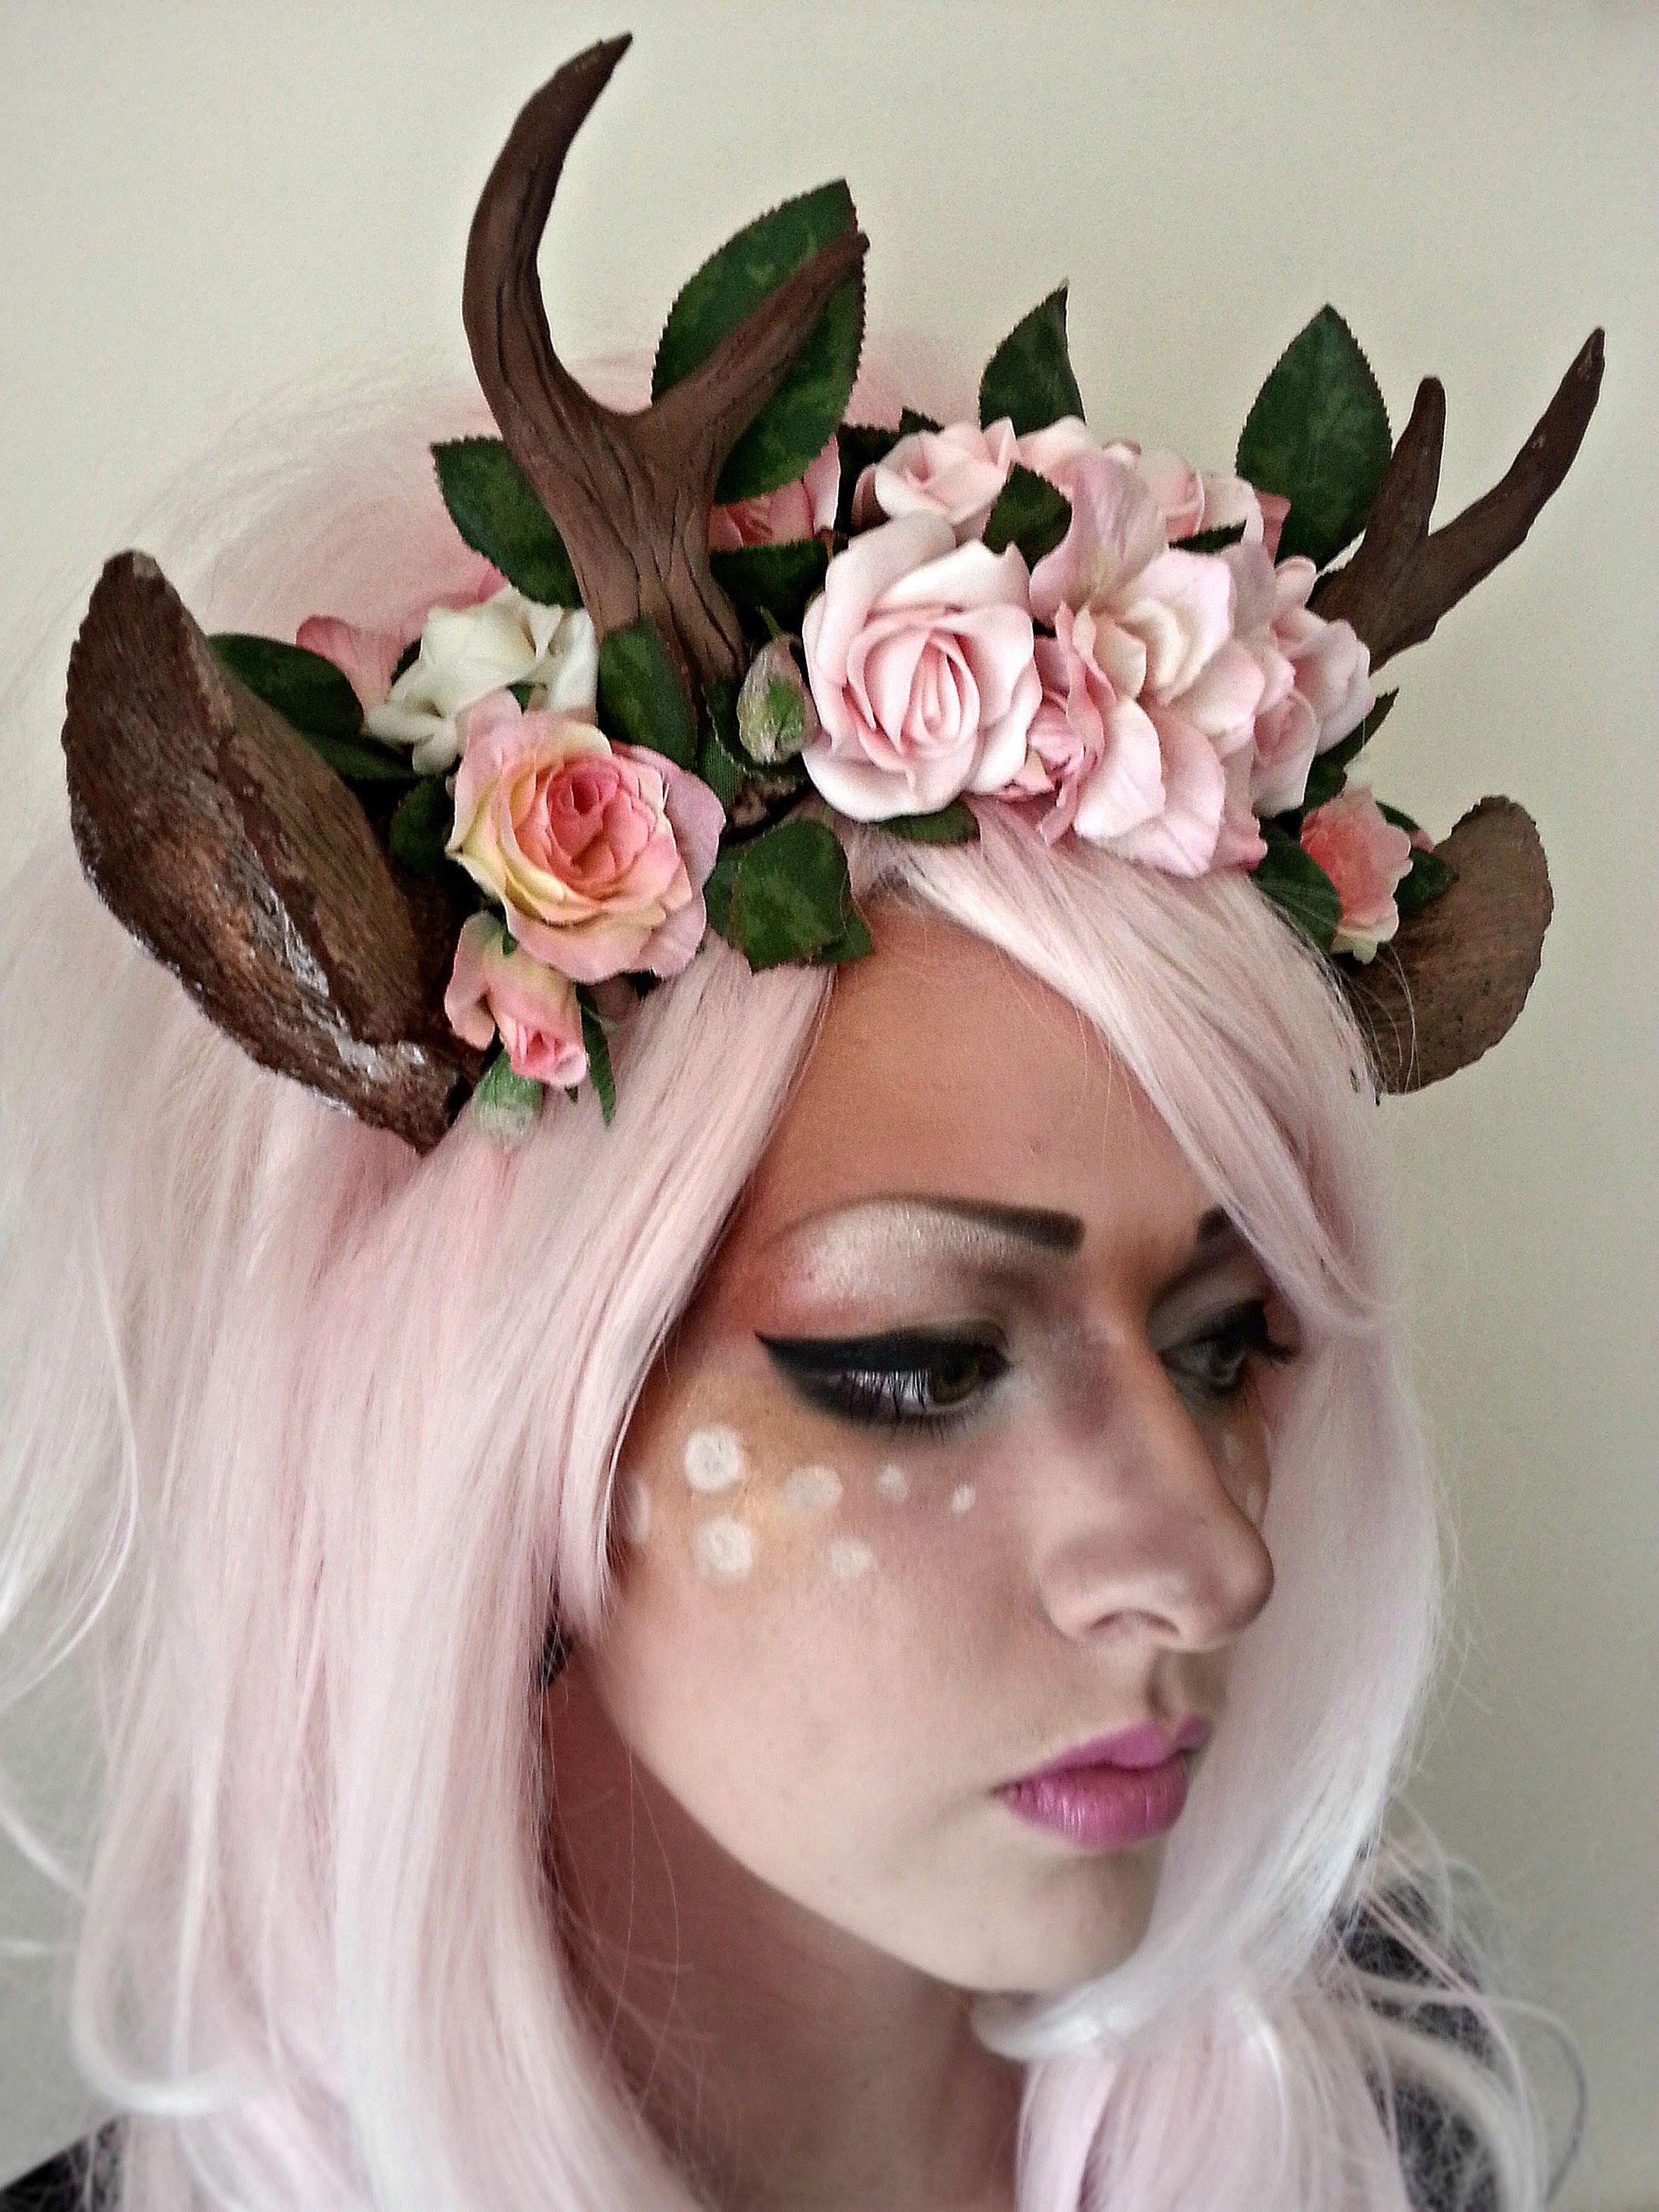 Shironuri deer head-dress · La Boutique Demone · Online Store ...